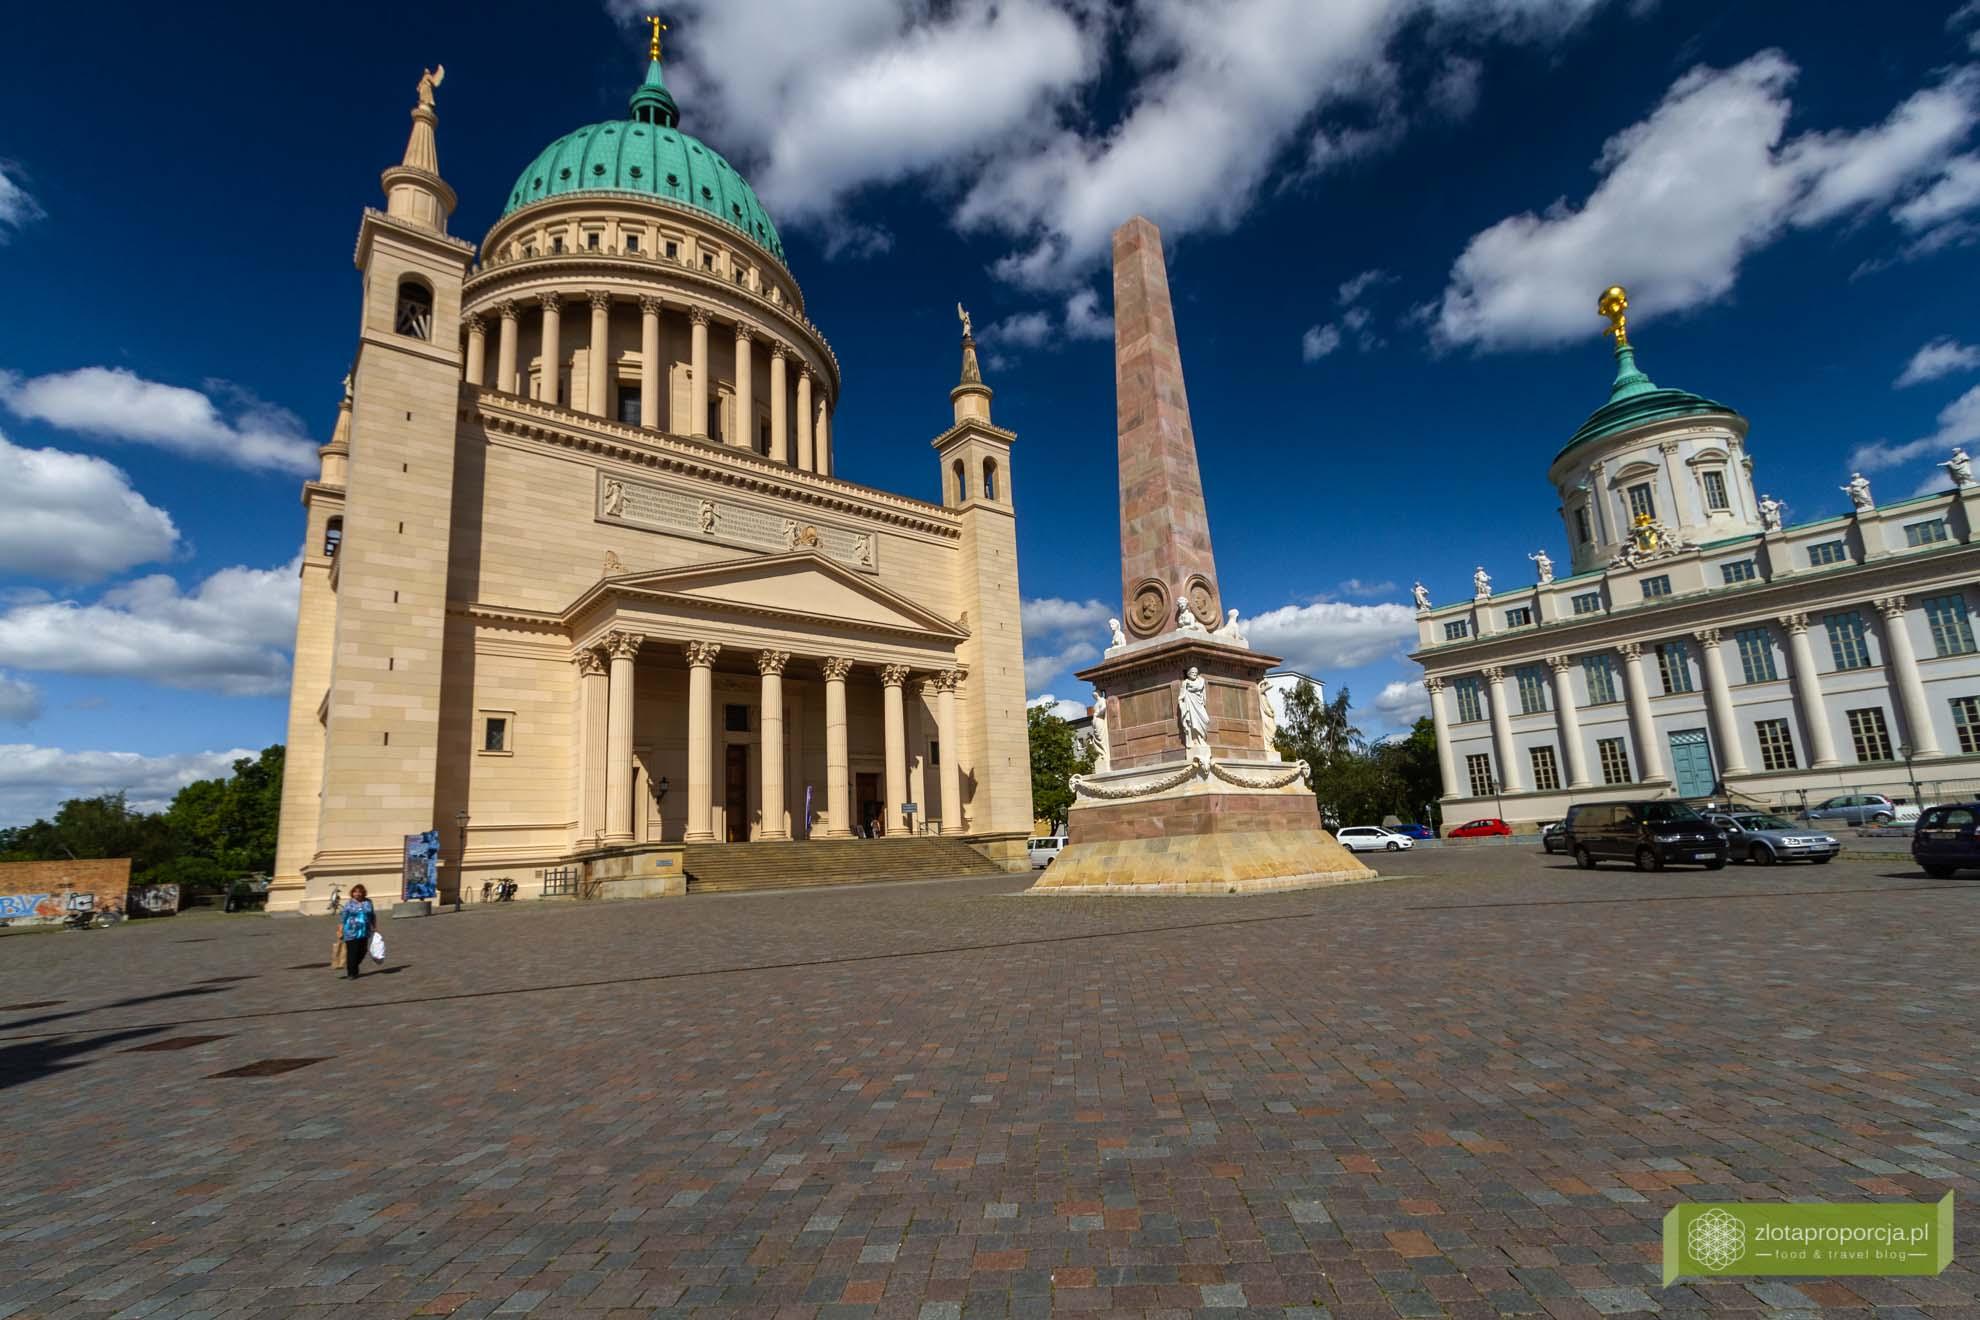 Poczdam, atrakcje Poczdamu, Brandenburgia, atrakcje Brandenburgii;